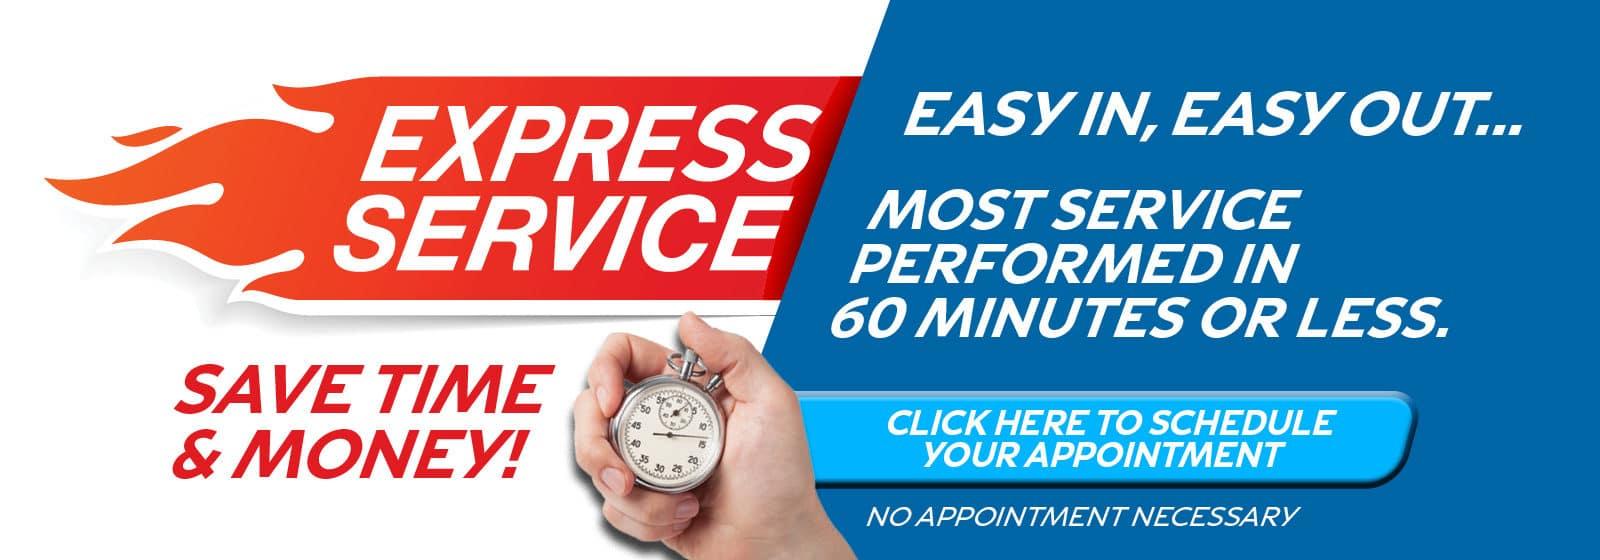 IONA-734 Express 1600×560